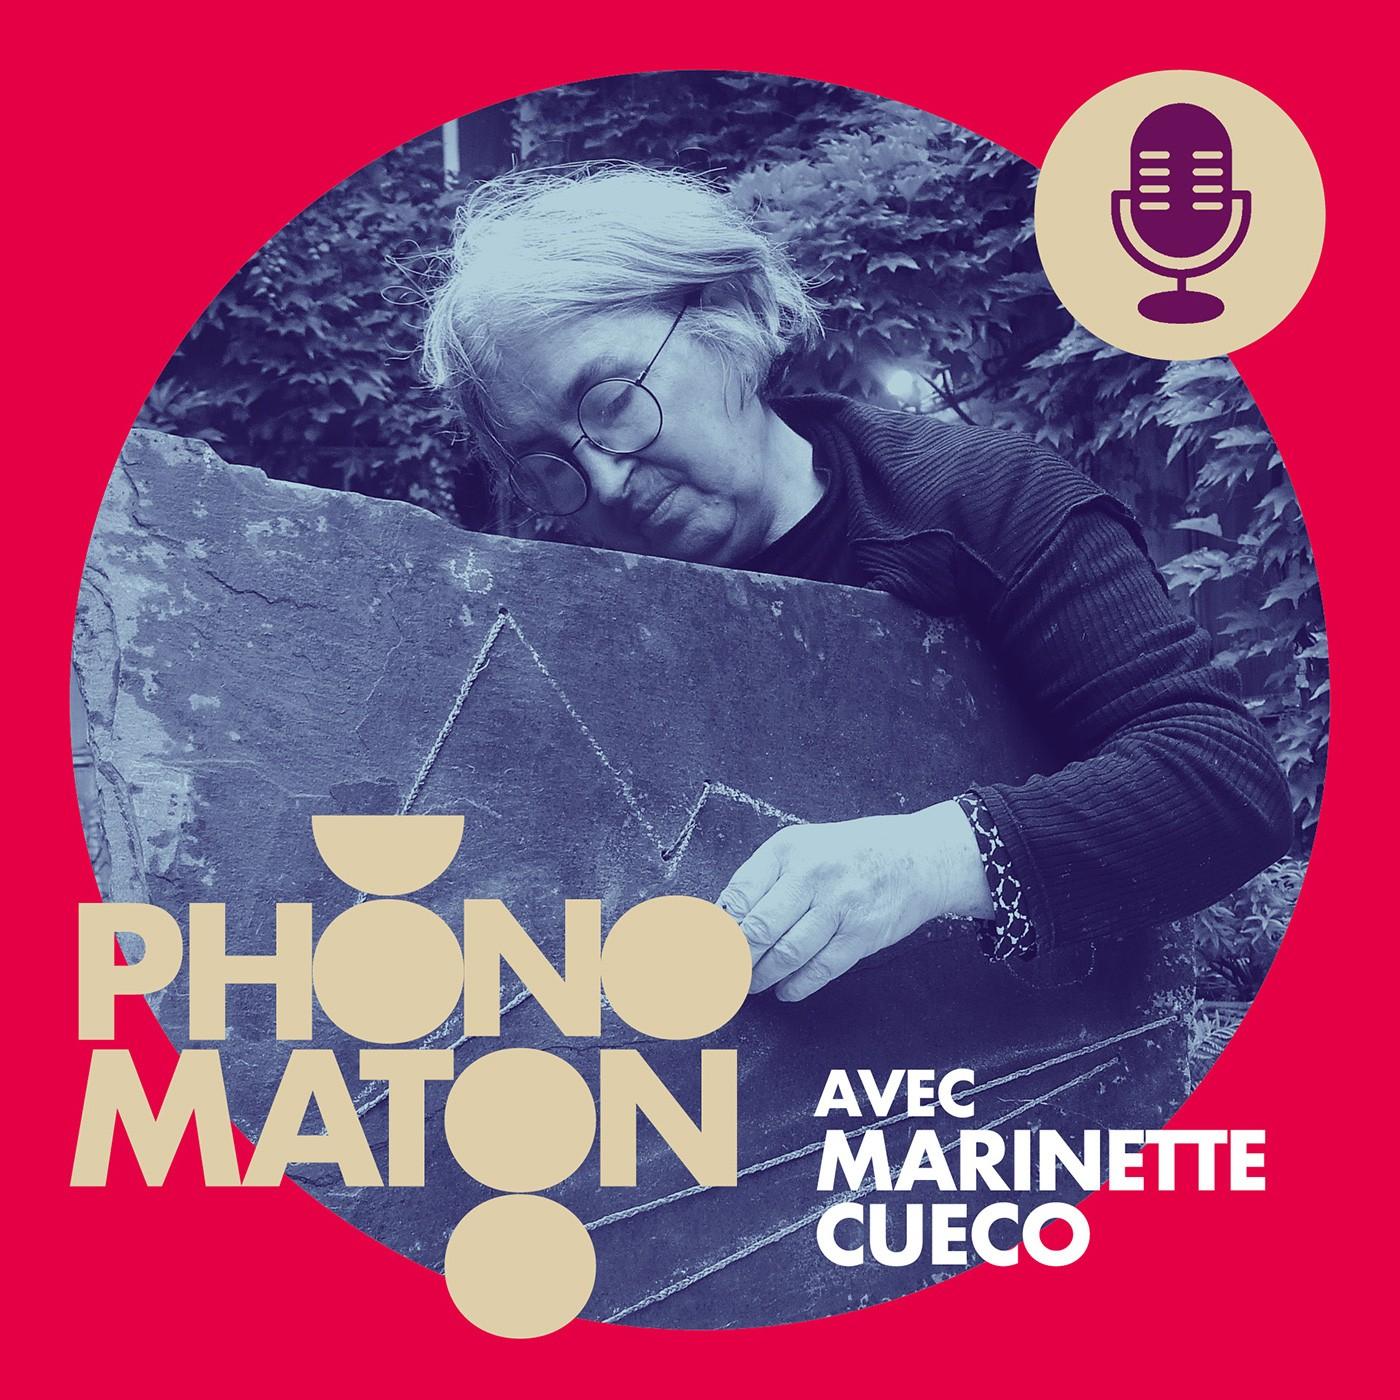 Phonomaton avec Marinette Cueco